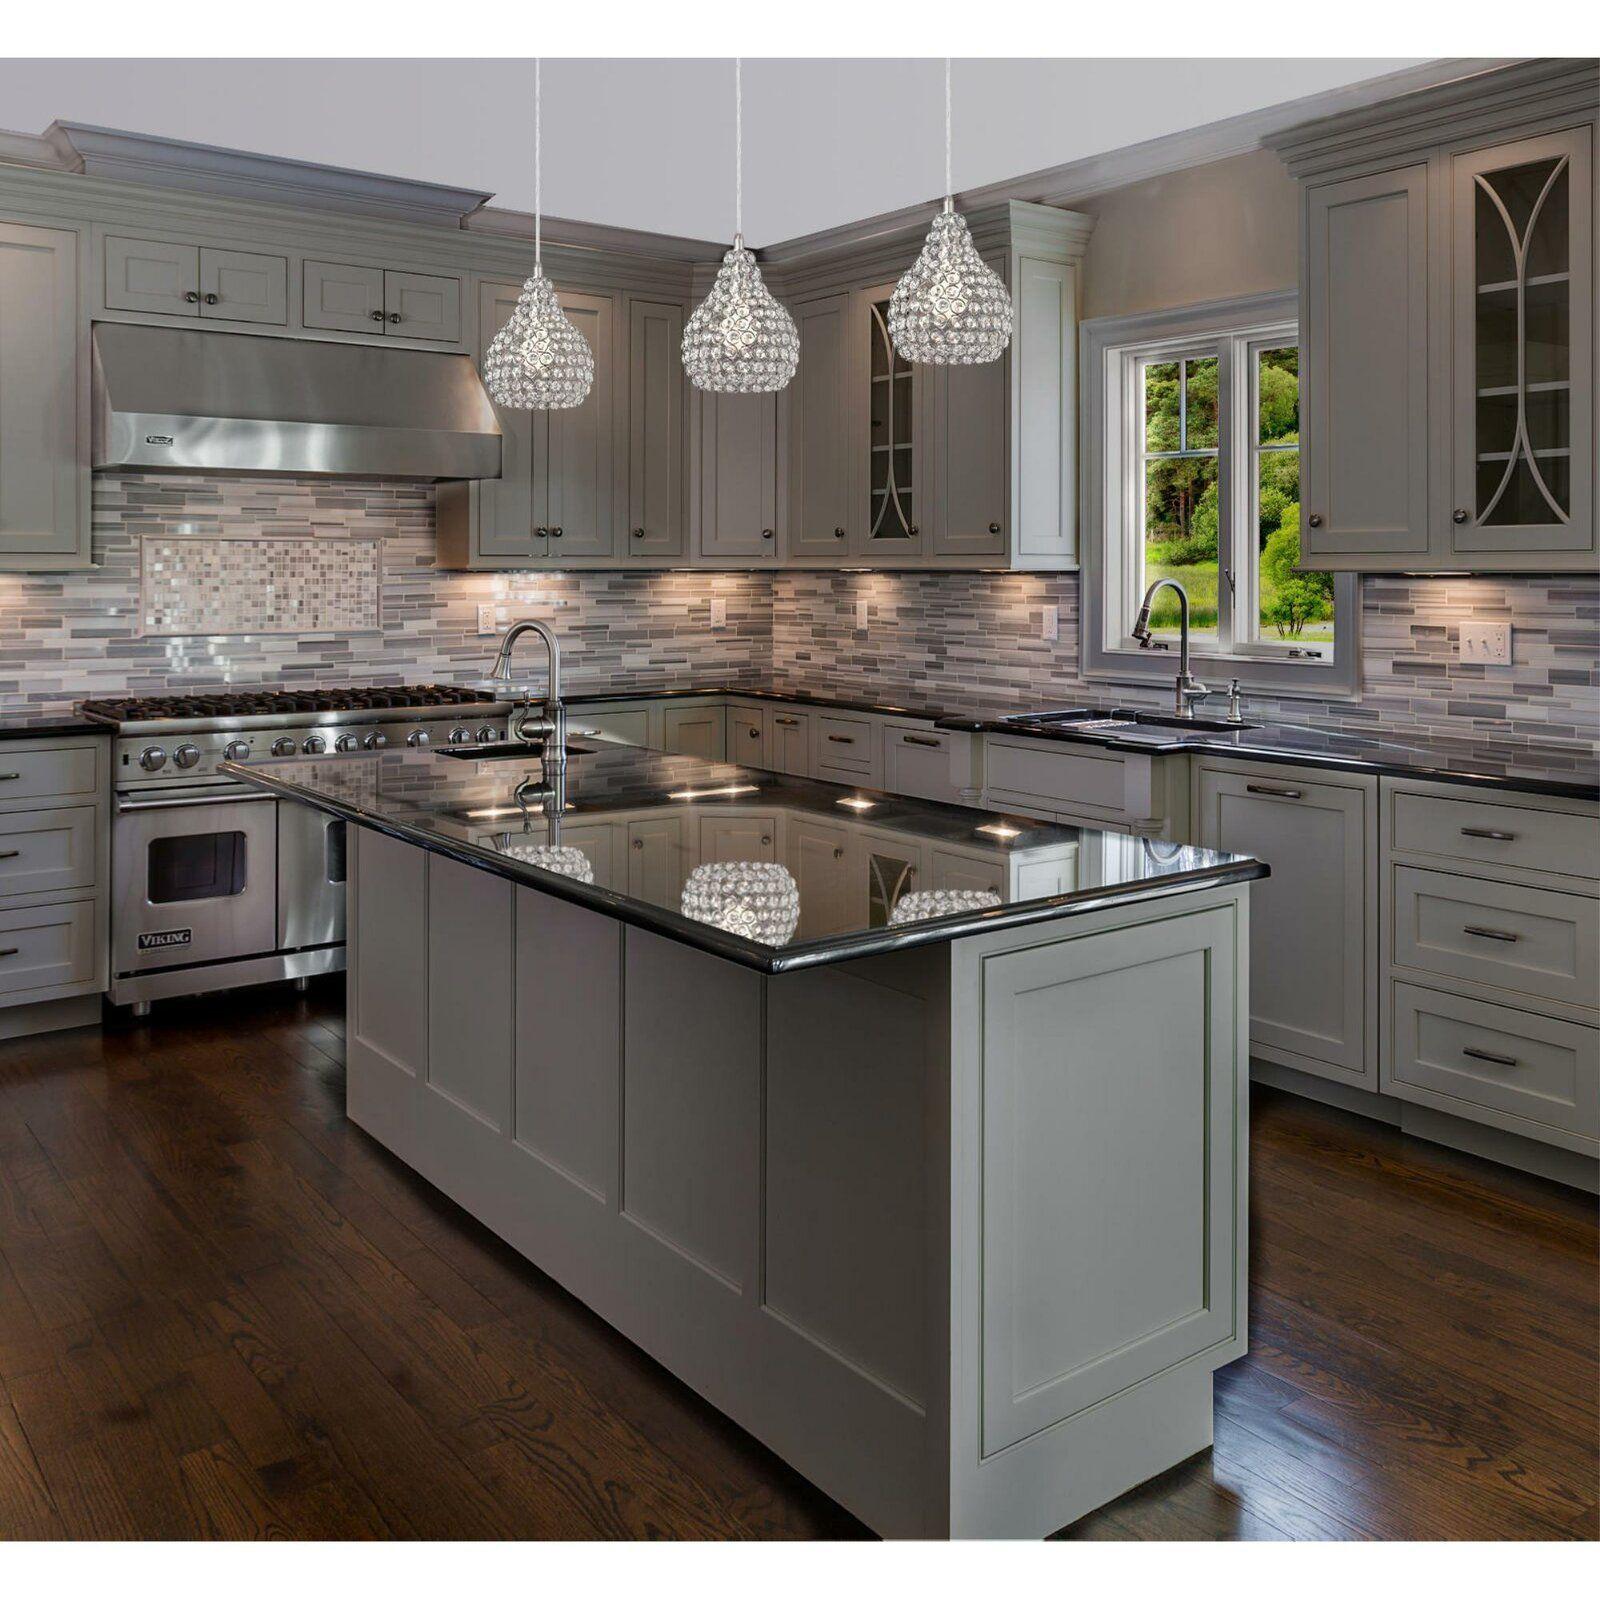 House Of Hampton Mcewen 1 Light Crystal Pendant Reviews Wayfair Kitchen Remodel Small Kitchen Design Home Decor Kitchen